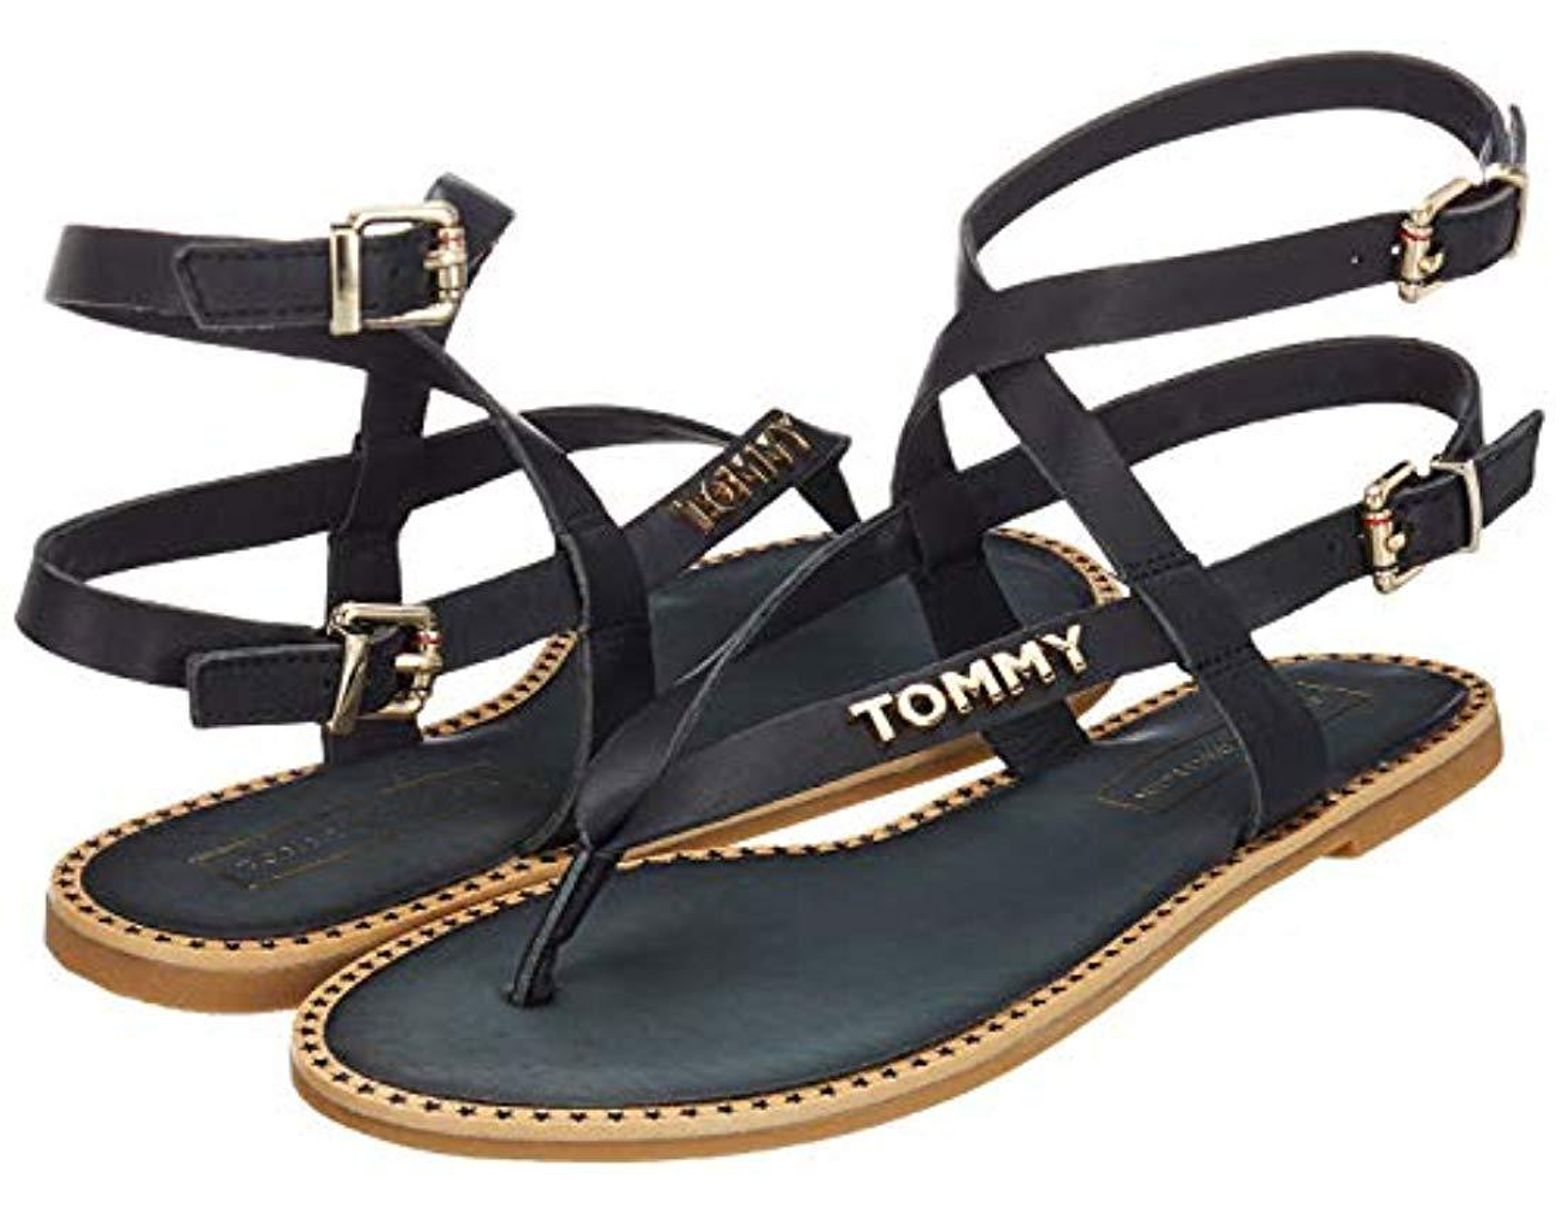 f9240d78ab Tommy Hilfiger Iconic Flat Strappy Sandal Flip Flops in Blue - Lyst